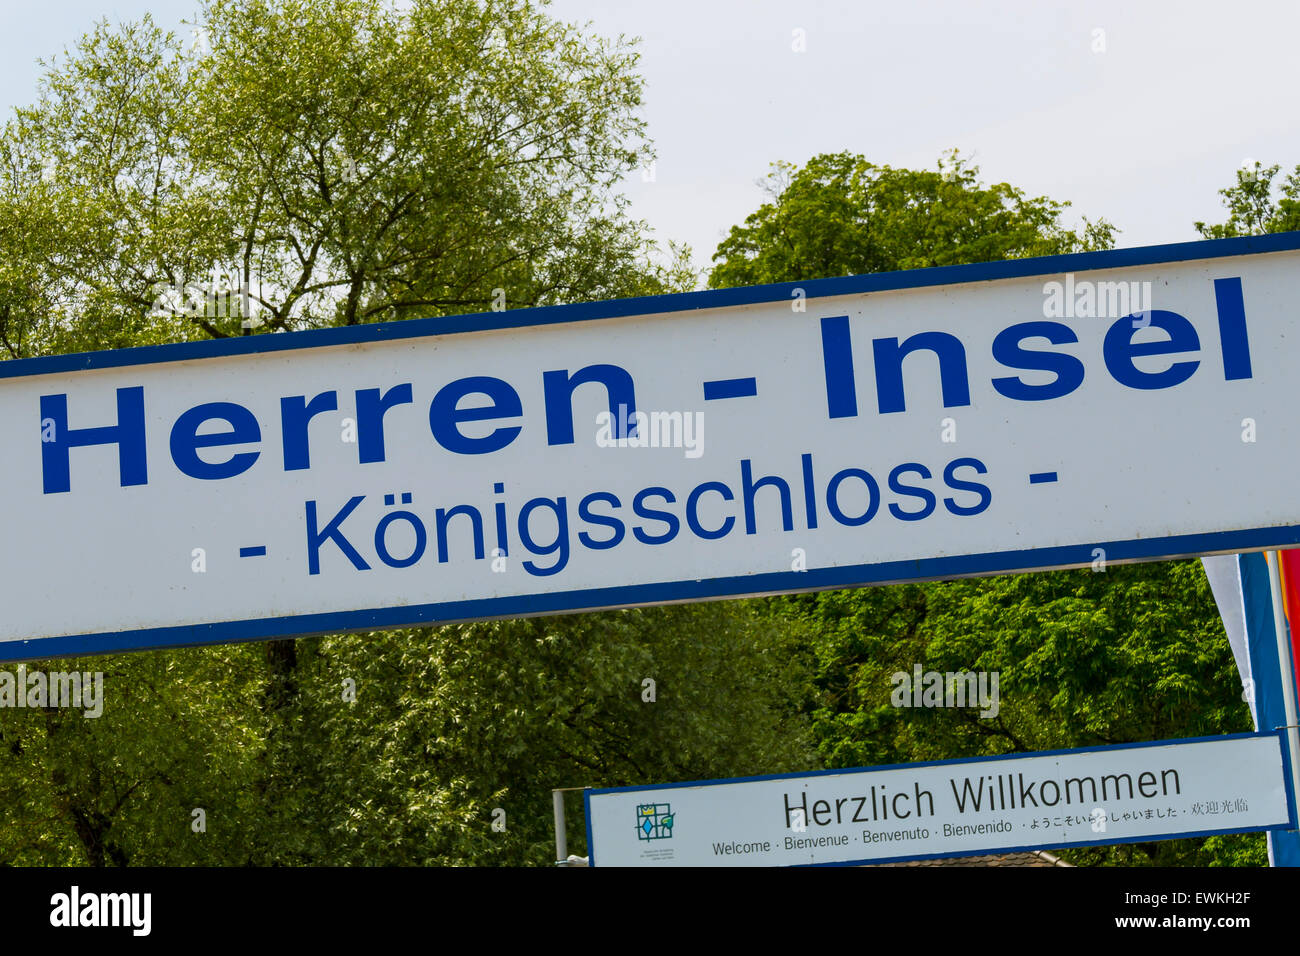 Sign to Schloss Herrenchiemsee on the Herreninsel, Chiemgau, Upper Bavaria, Bavaria, Germany, Europe - Stock Image